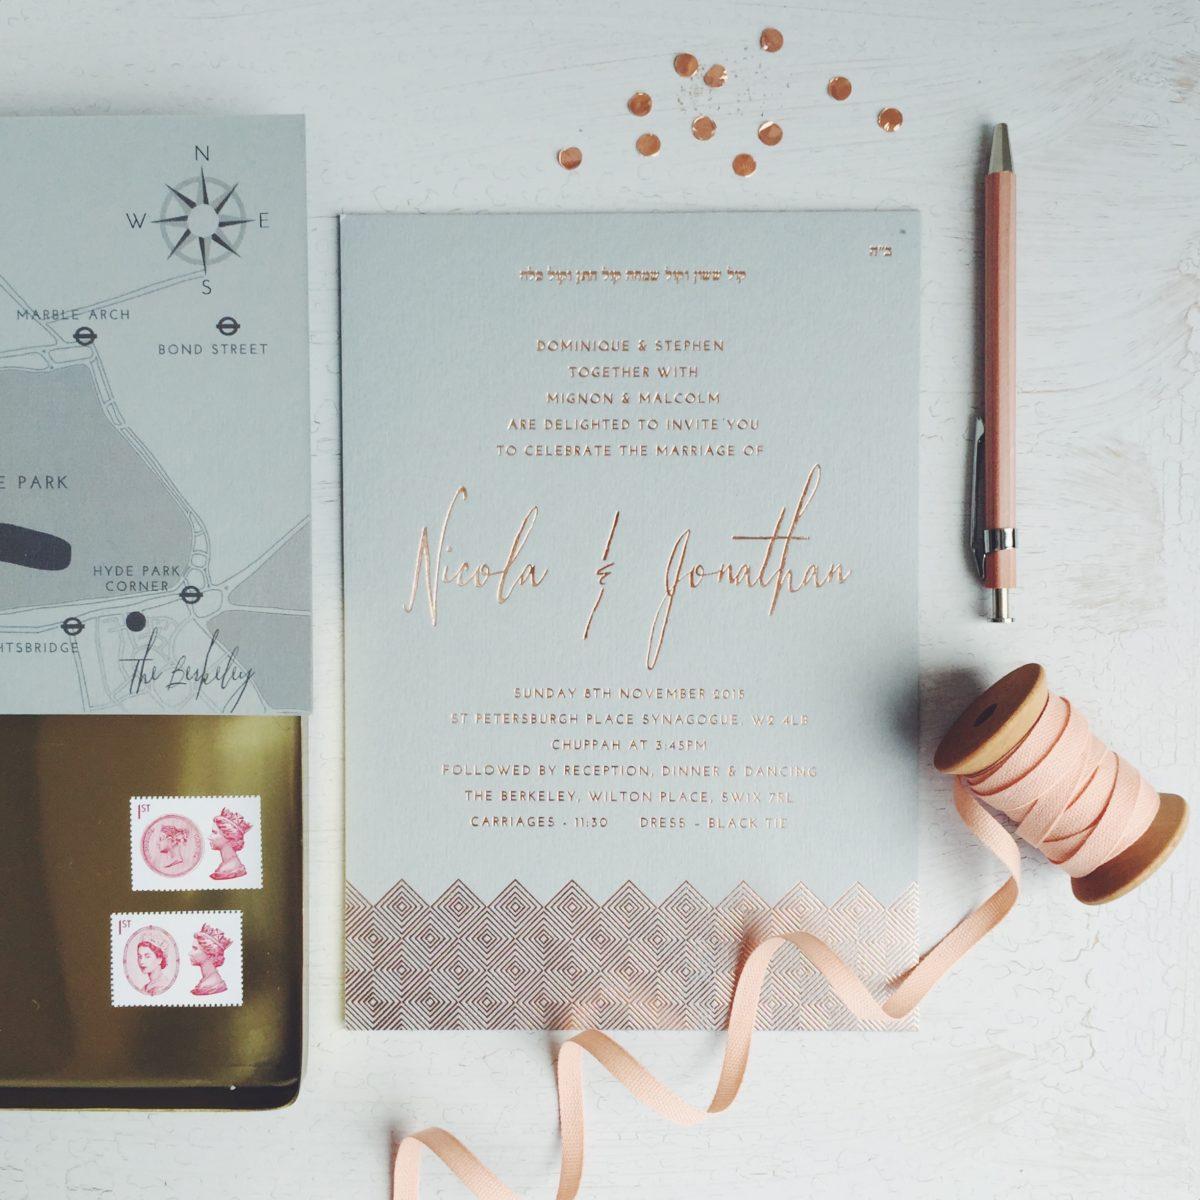 Bespoke Copper foil invitation Berkley London on grey card